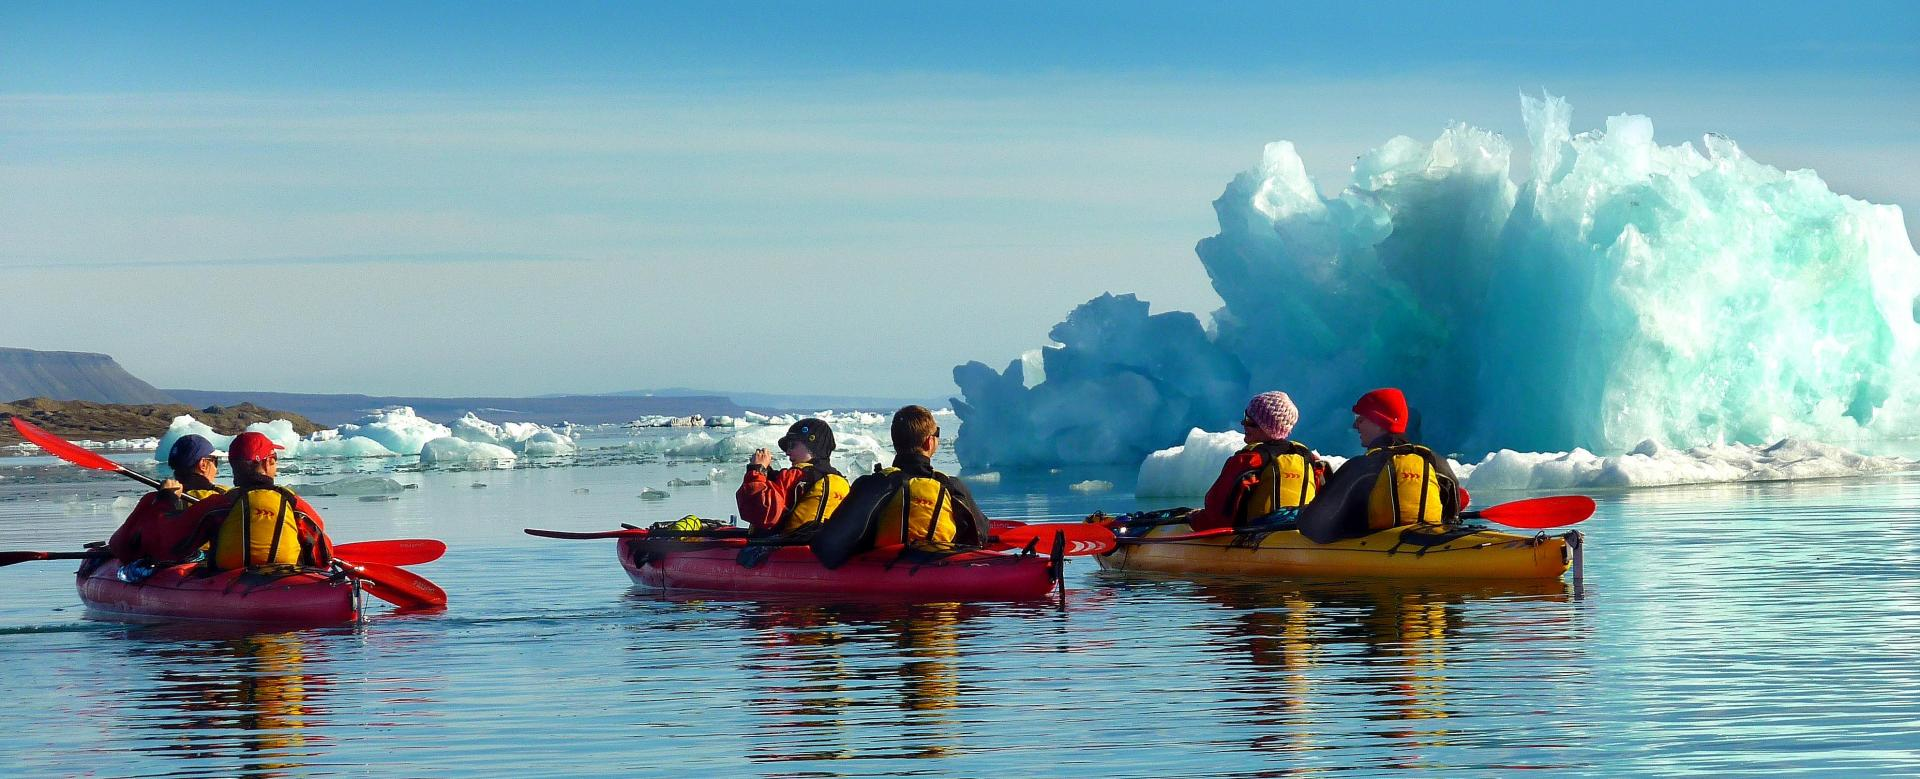 Voyage à la neige Norvège : Visages du spitzberg